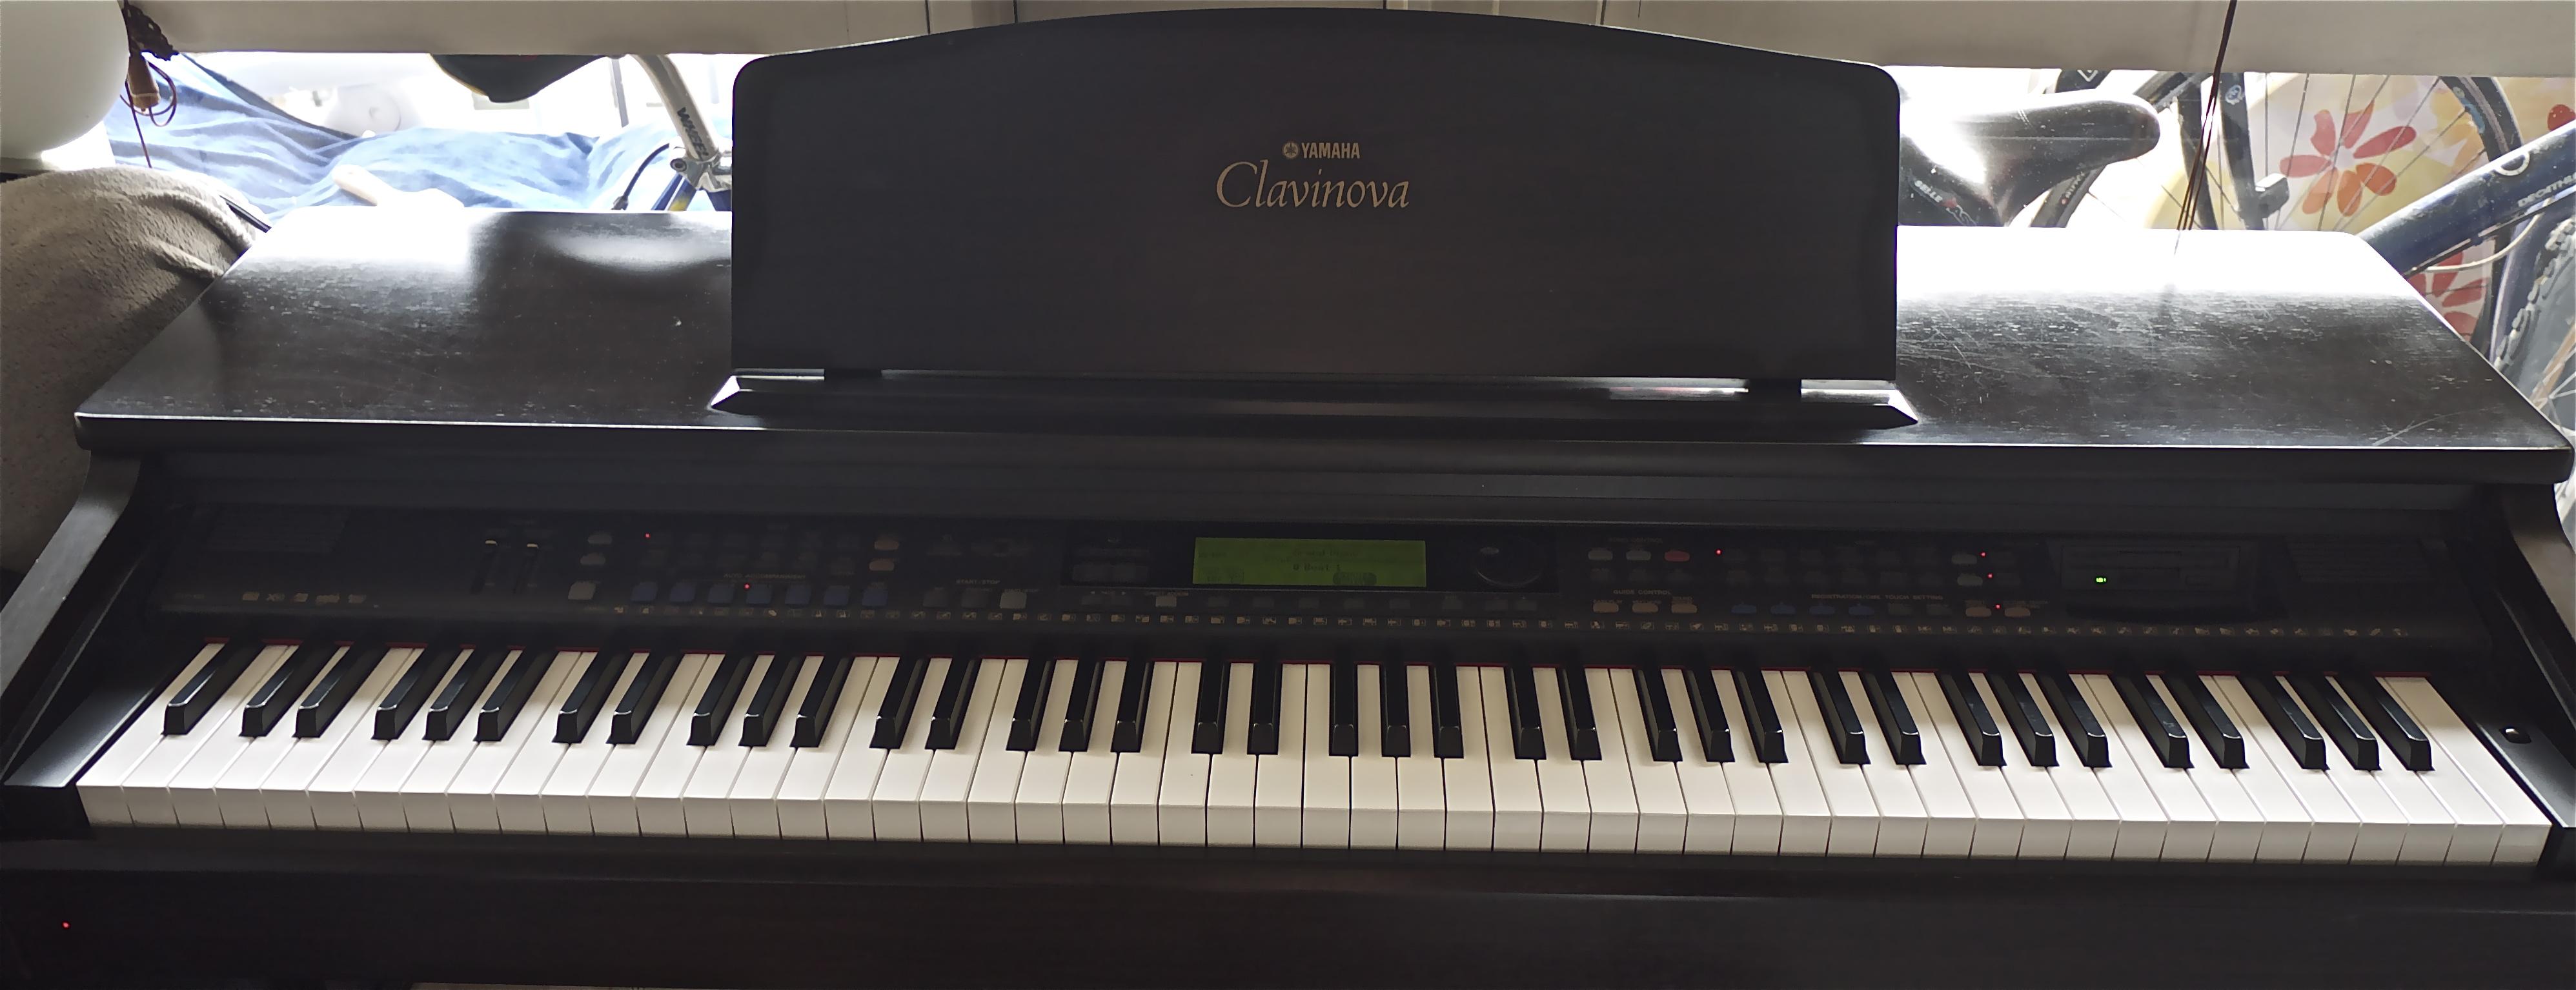 yamaha cvp 103 image 344891 audiofanzine rh en audiofanzine com Yamaha Clavinova Piano yamaha clavinova cvp-103 user manual